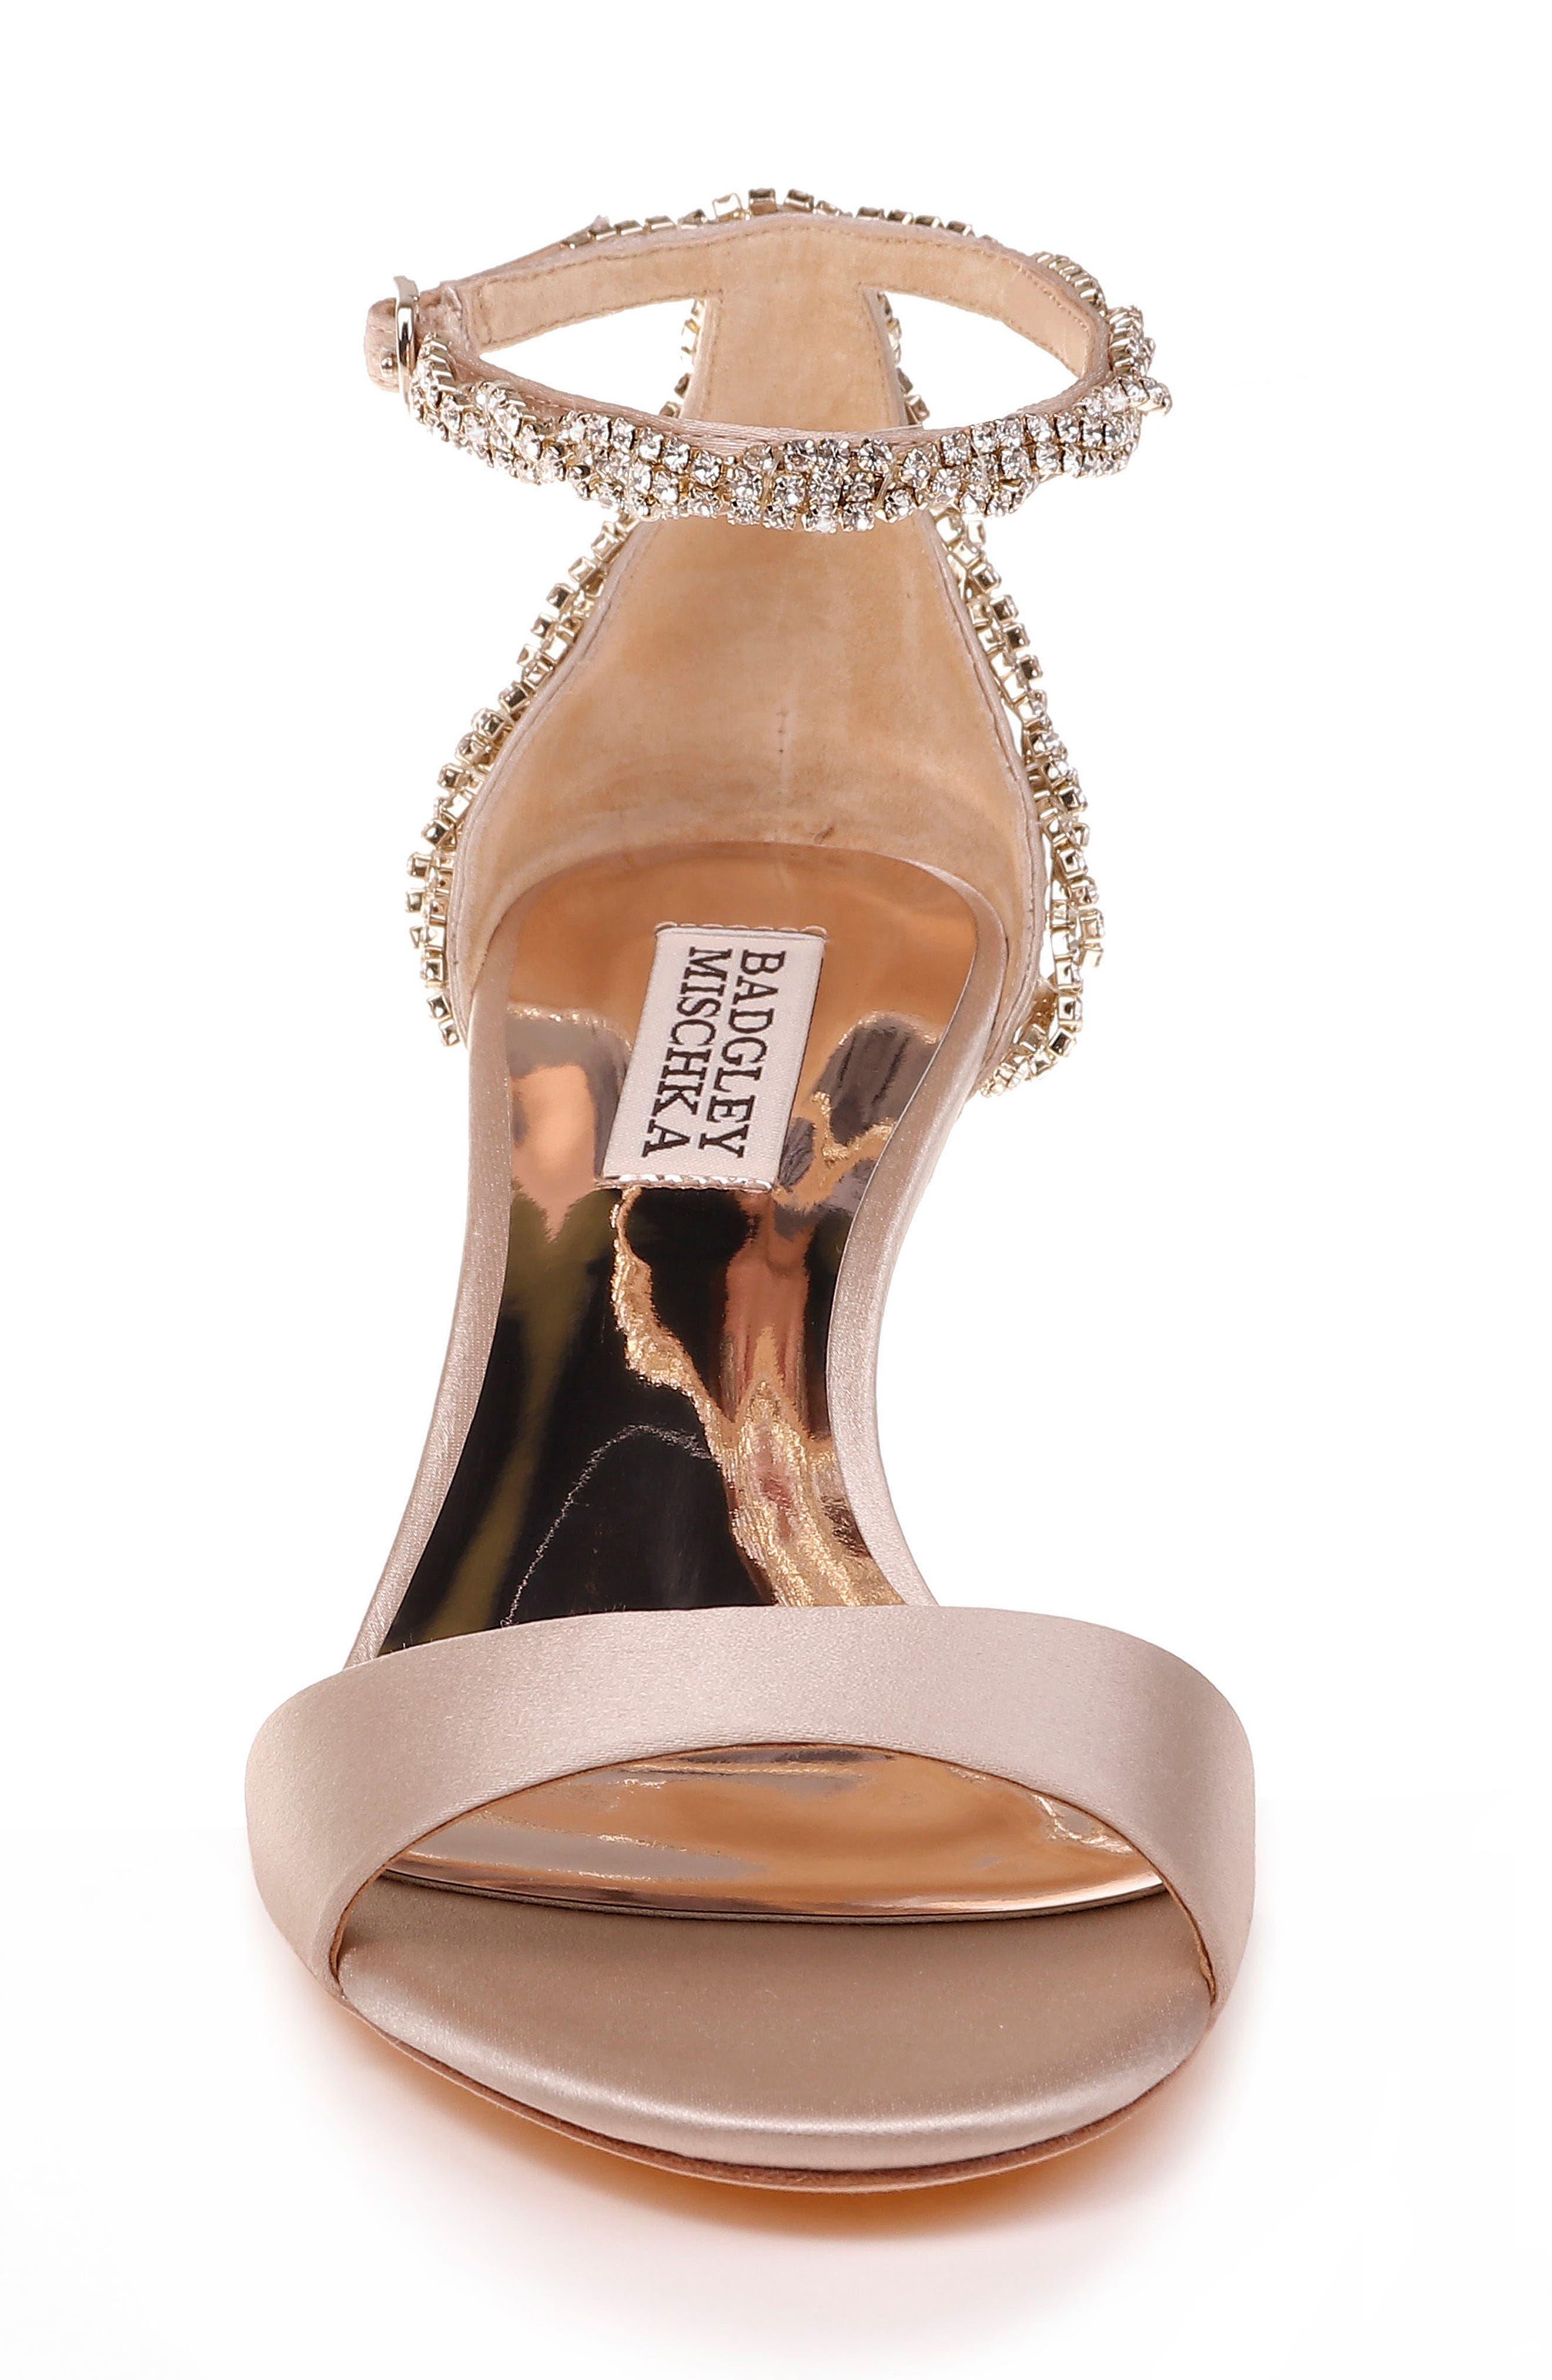 Yareli Crystal Embellished Sandal,                             Alternate thumbnail 4, color,                             NUDE SATIN